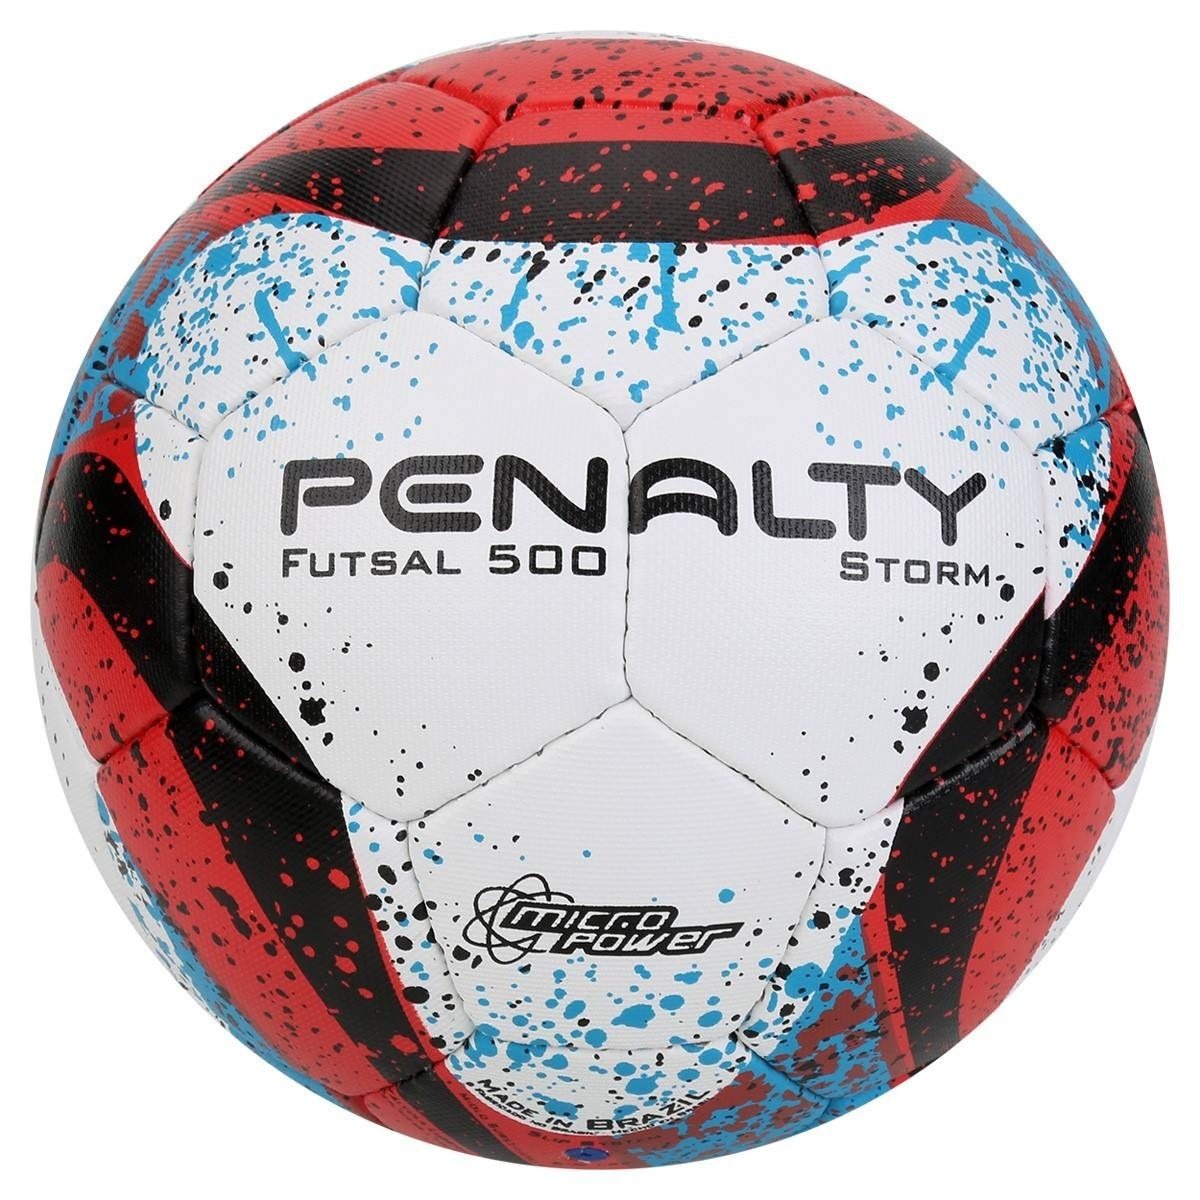 pelota penalty storm futsal papi envios. Cargando zoom. 74106902a2e78